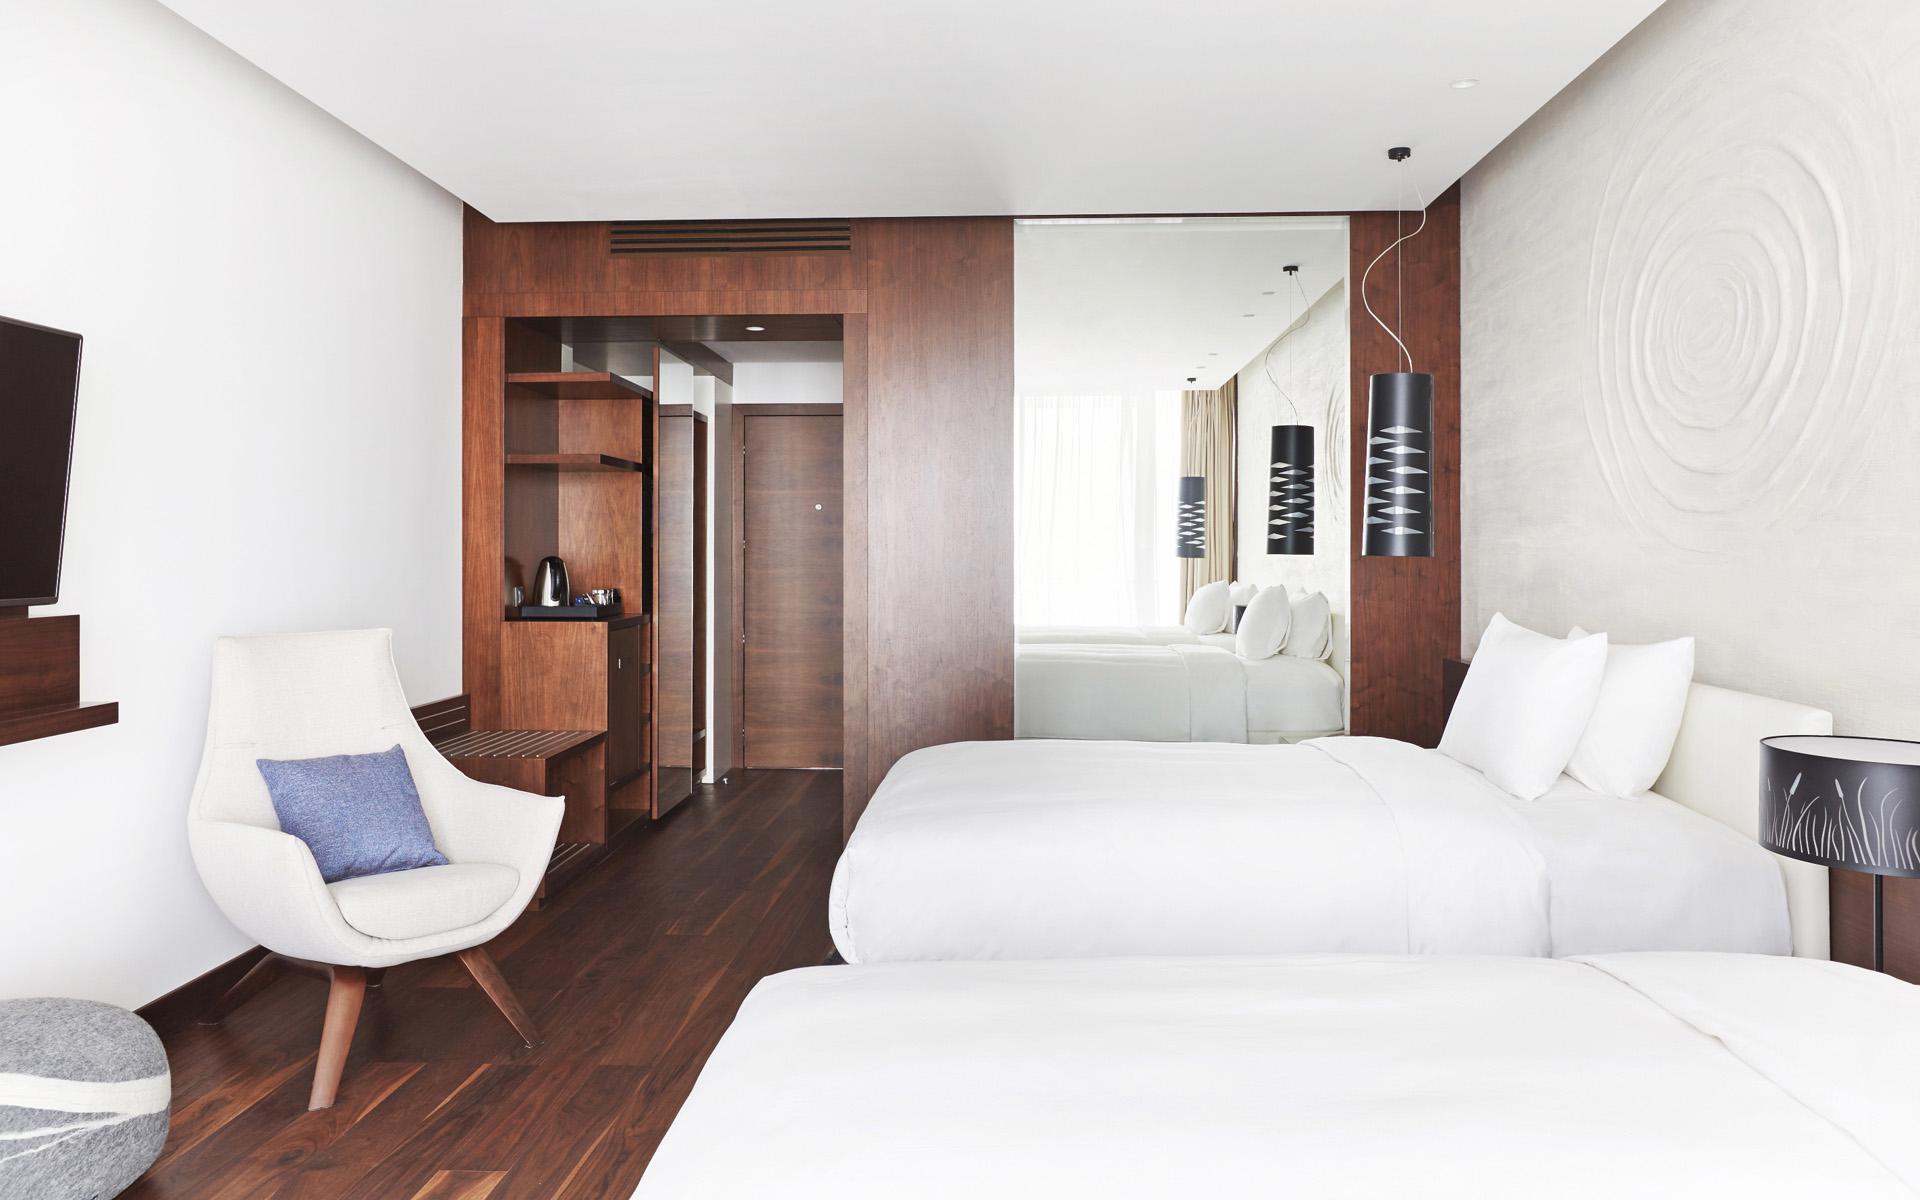 Marriott-Minsk_Belarus_Belorusija-rooms-apartments-zimmer-oprema-hotelov_hotel-equipment_hoteleinrichtungen_1